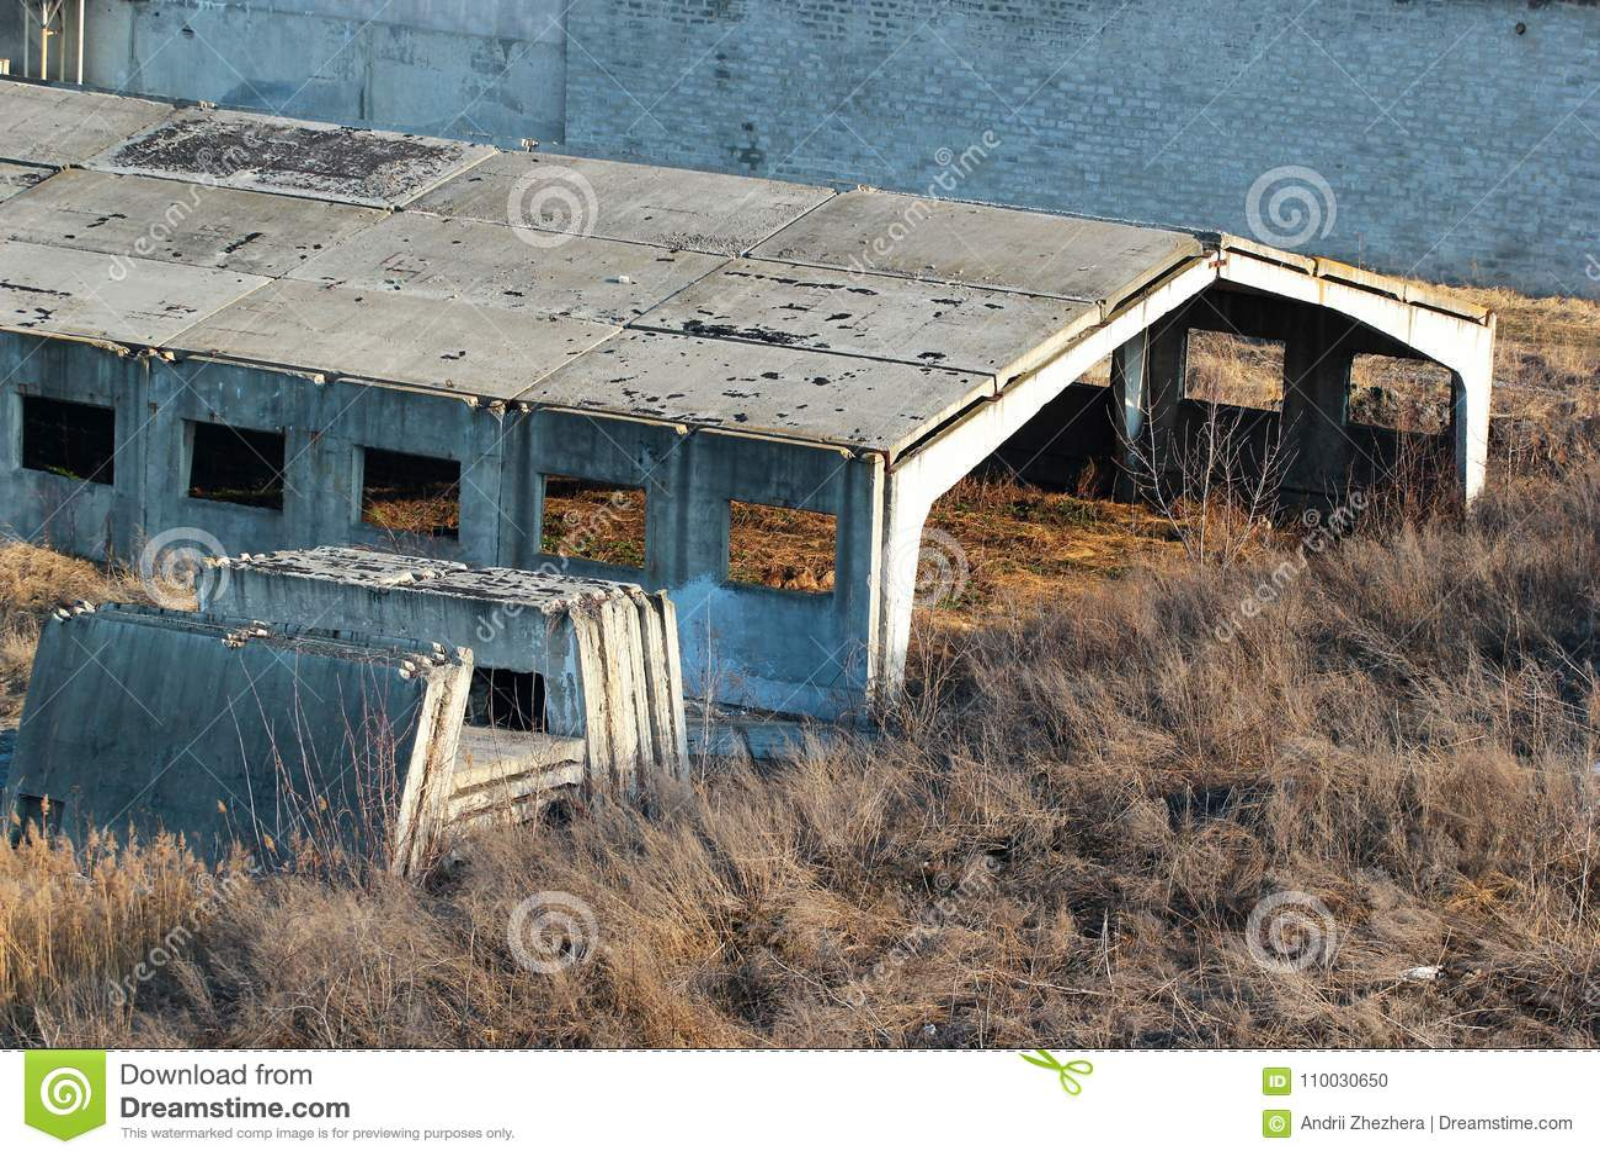 Hangar concreto inacabado abandonado